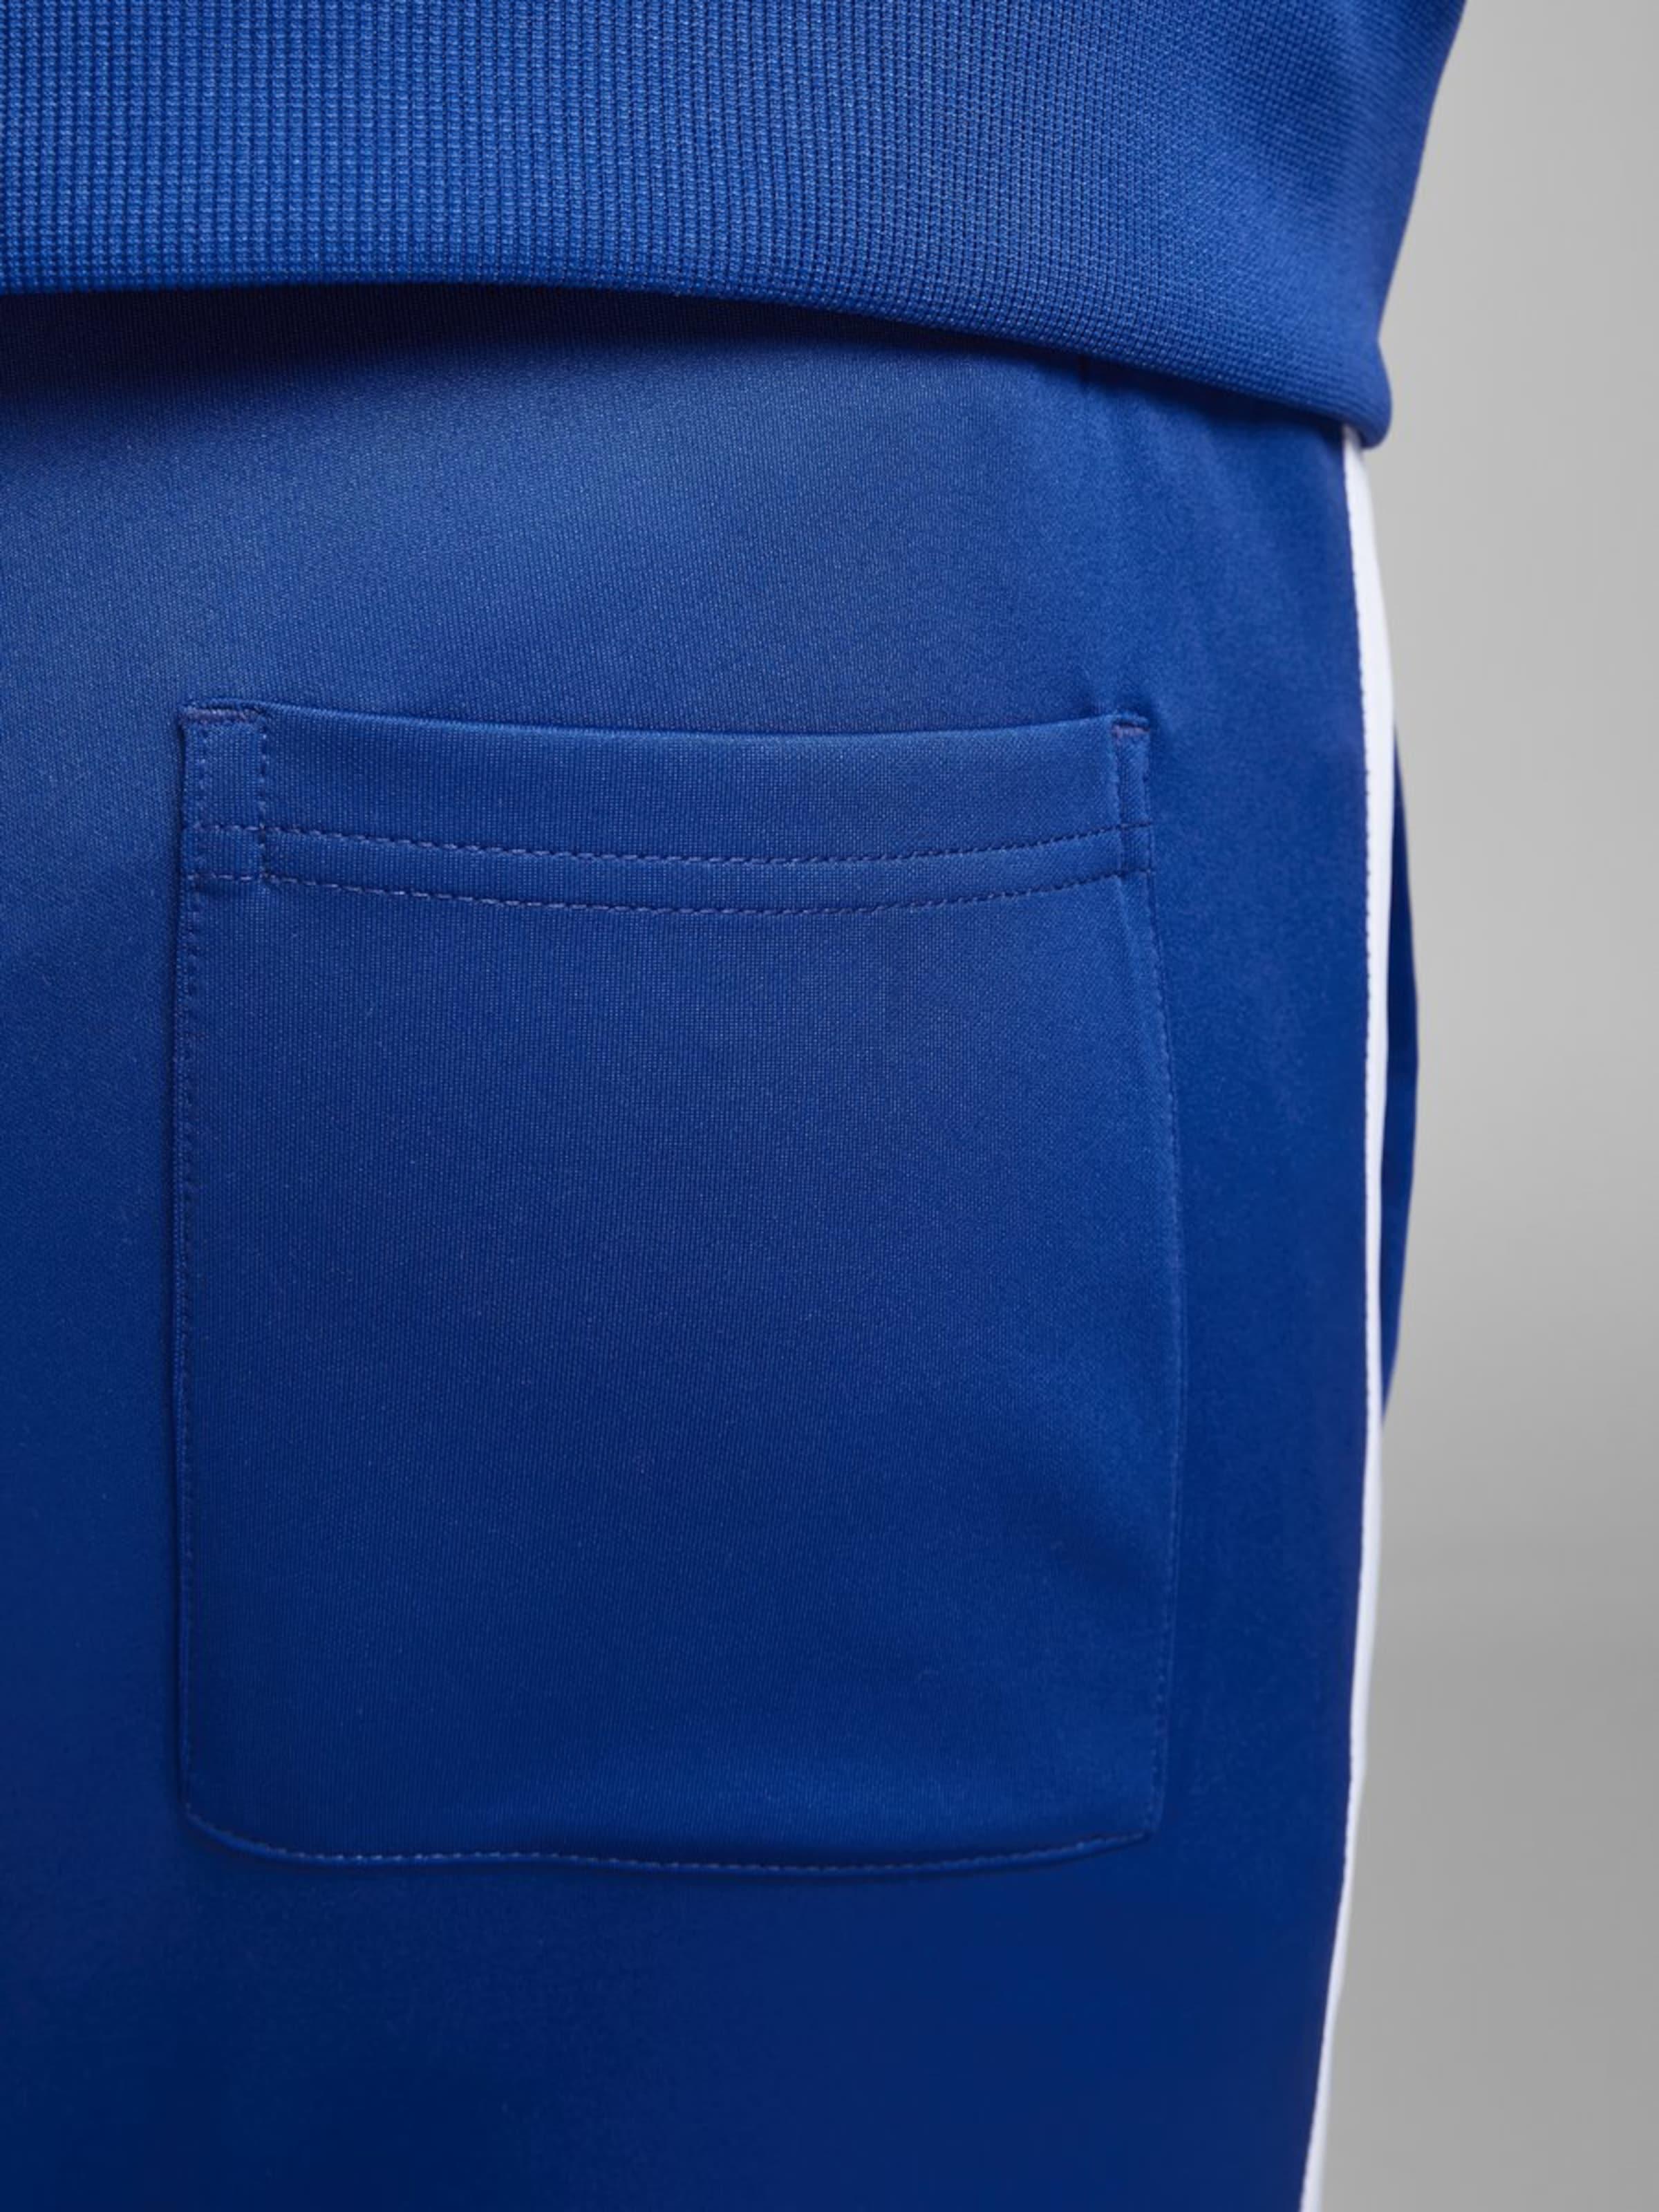 BleuBlanc Pantalon Pantalon Jackamp; Jones BleuBlanc Pantalon Jones En Jackamp; Jackamp; En Jones c1JTlKF